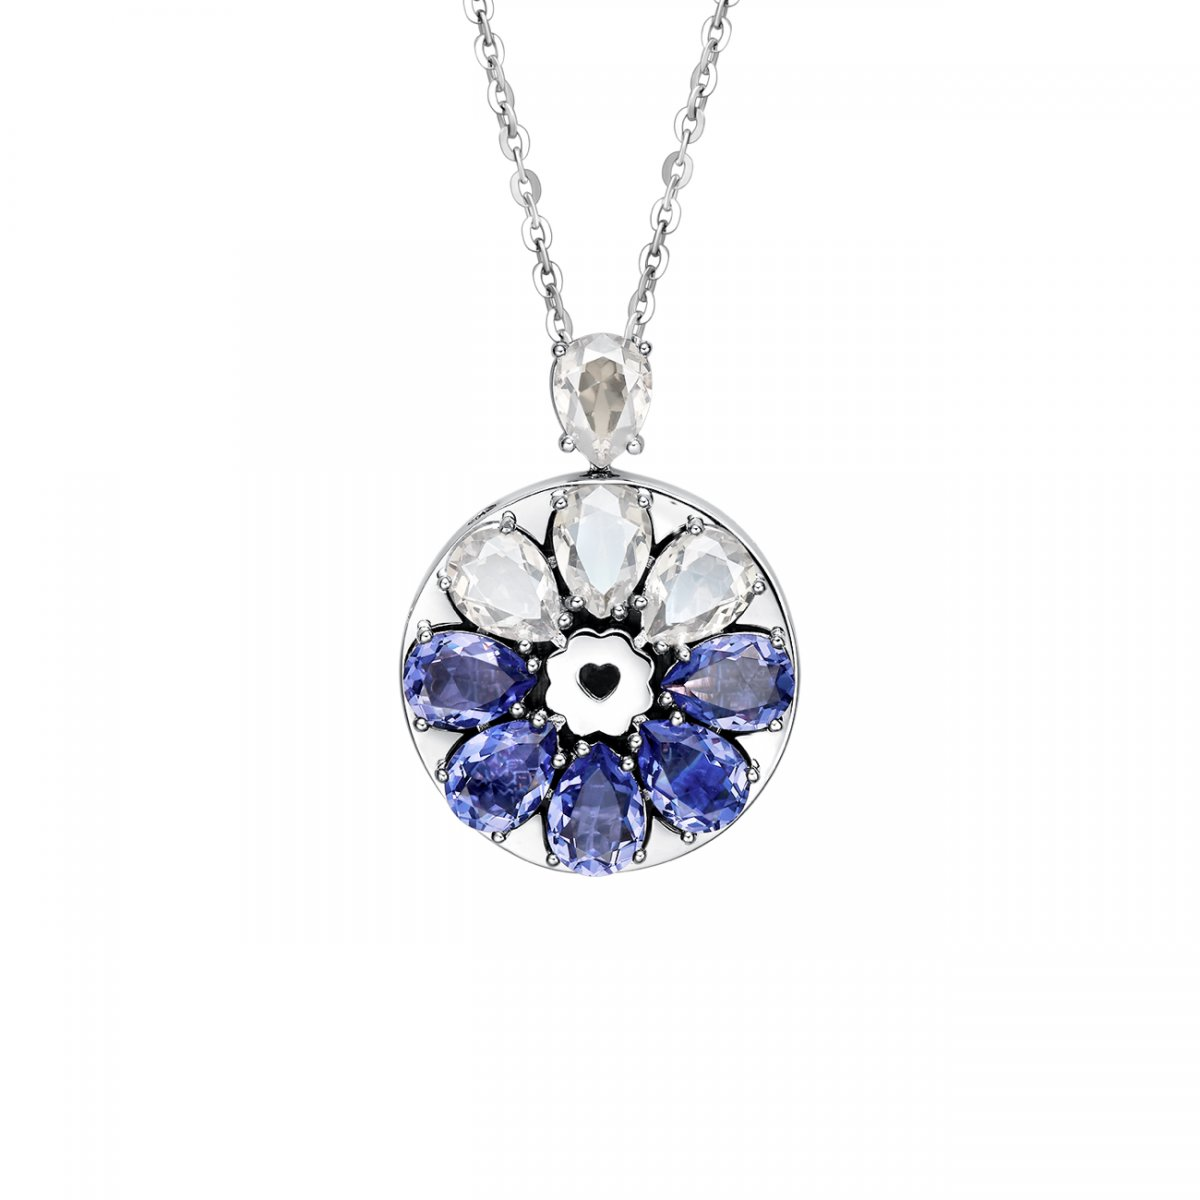 Totwoo Swarovski sea wind necklace